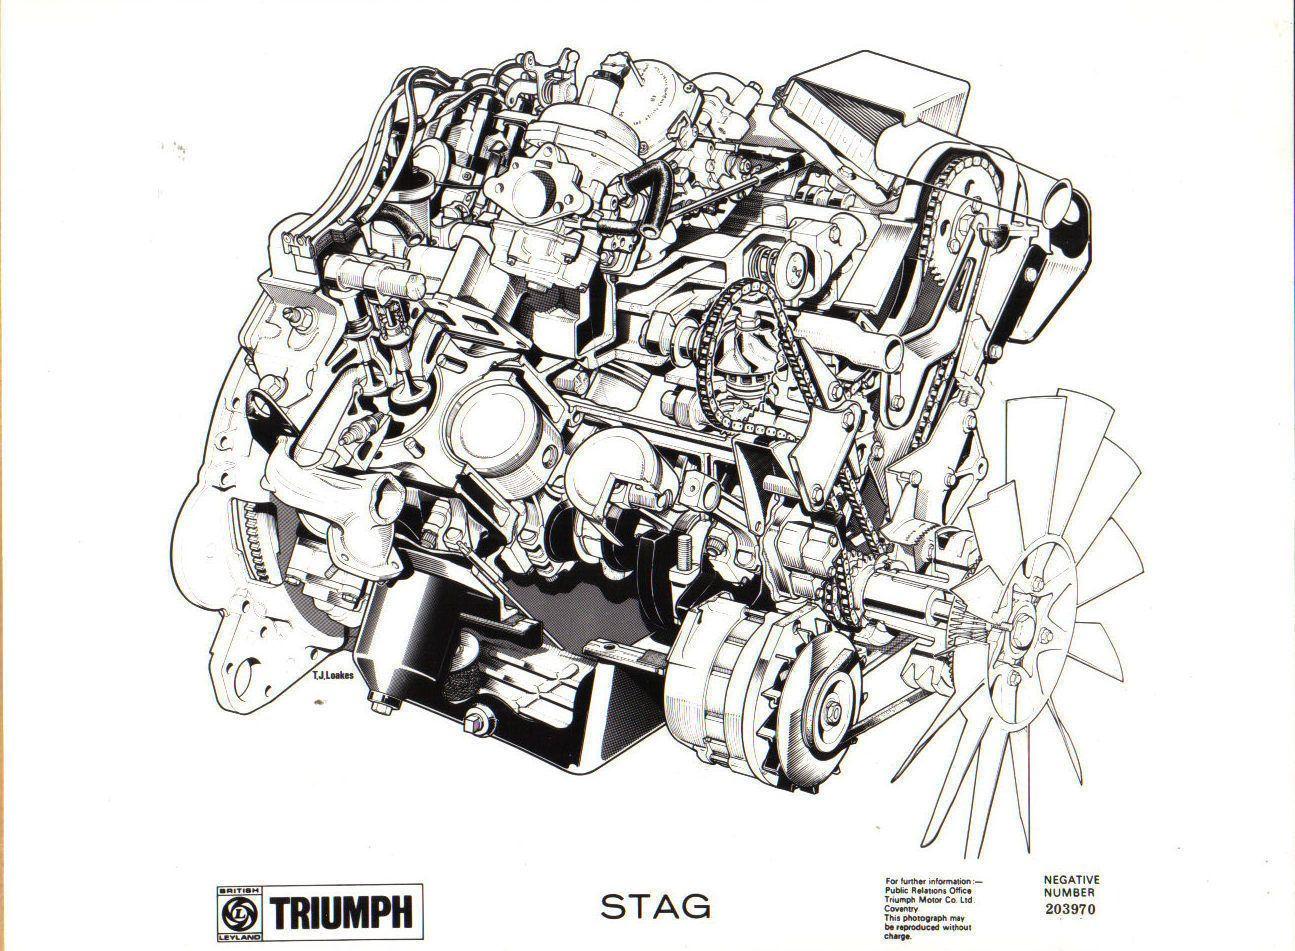 Triumph Stag original black & white Press Photograph of the engine No.  203970 | eBay